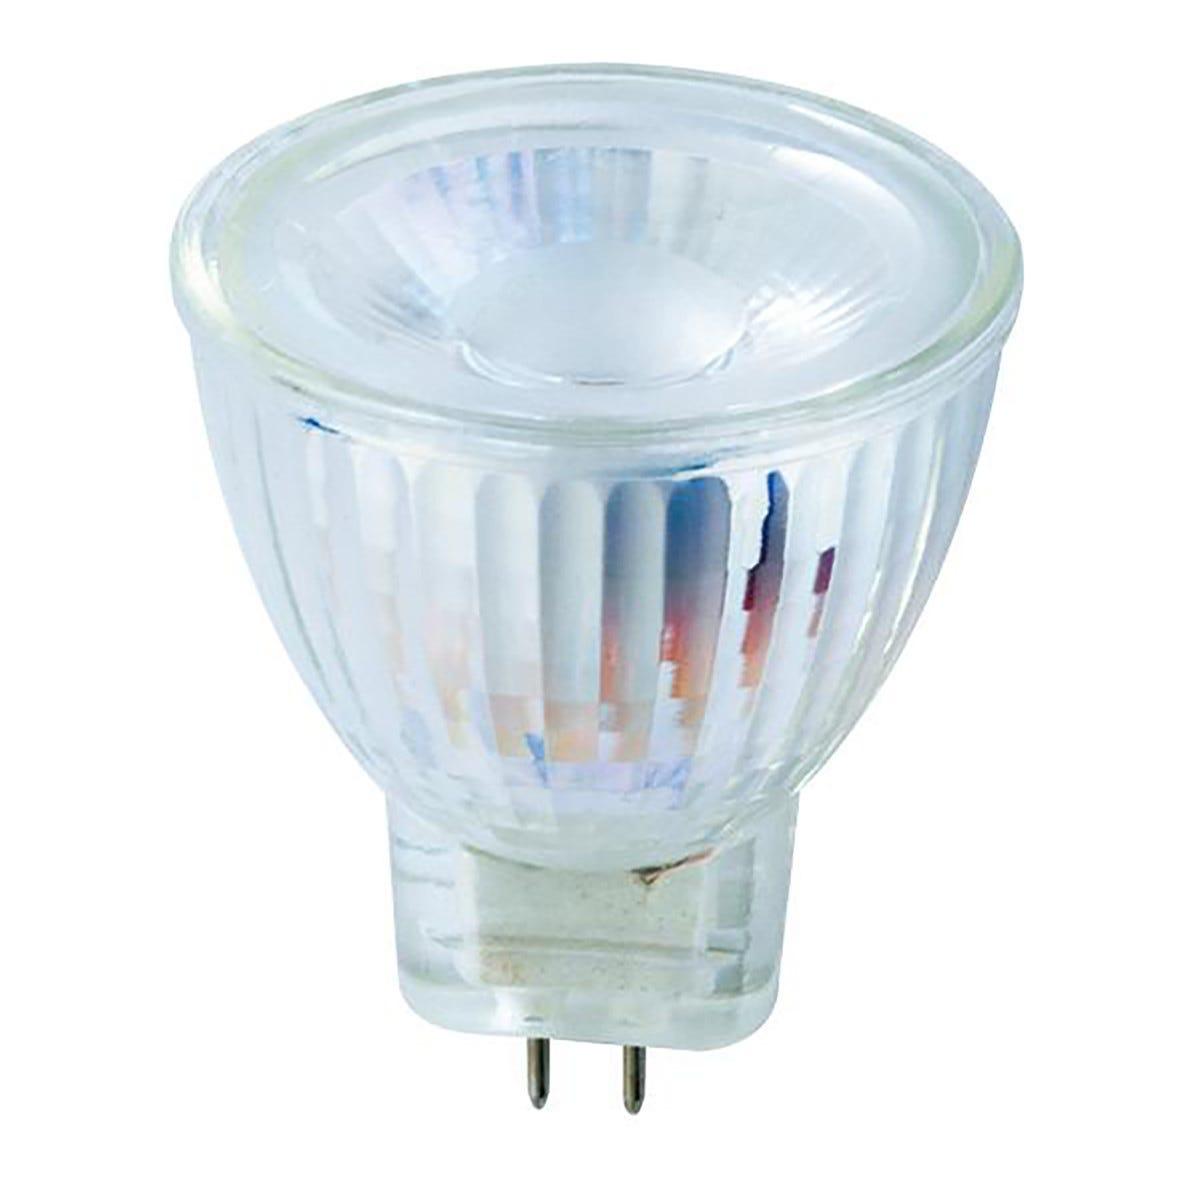 parko 2 lampadine  led mr11 gu4 3w=24w 240 lumen 3000k luce calda Ø 34x40 mm